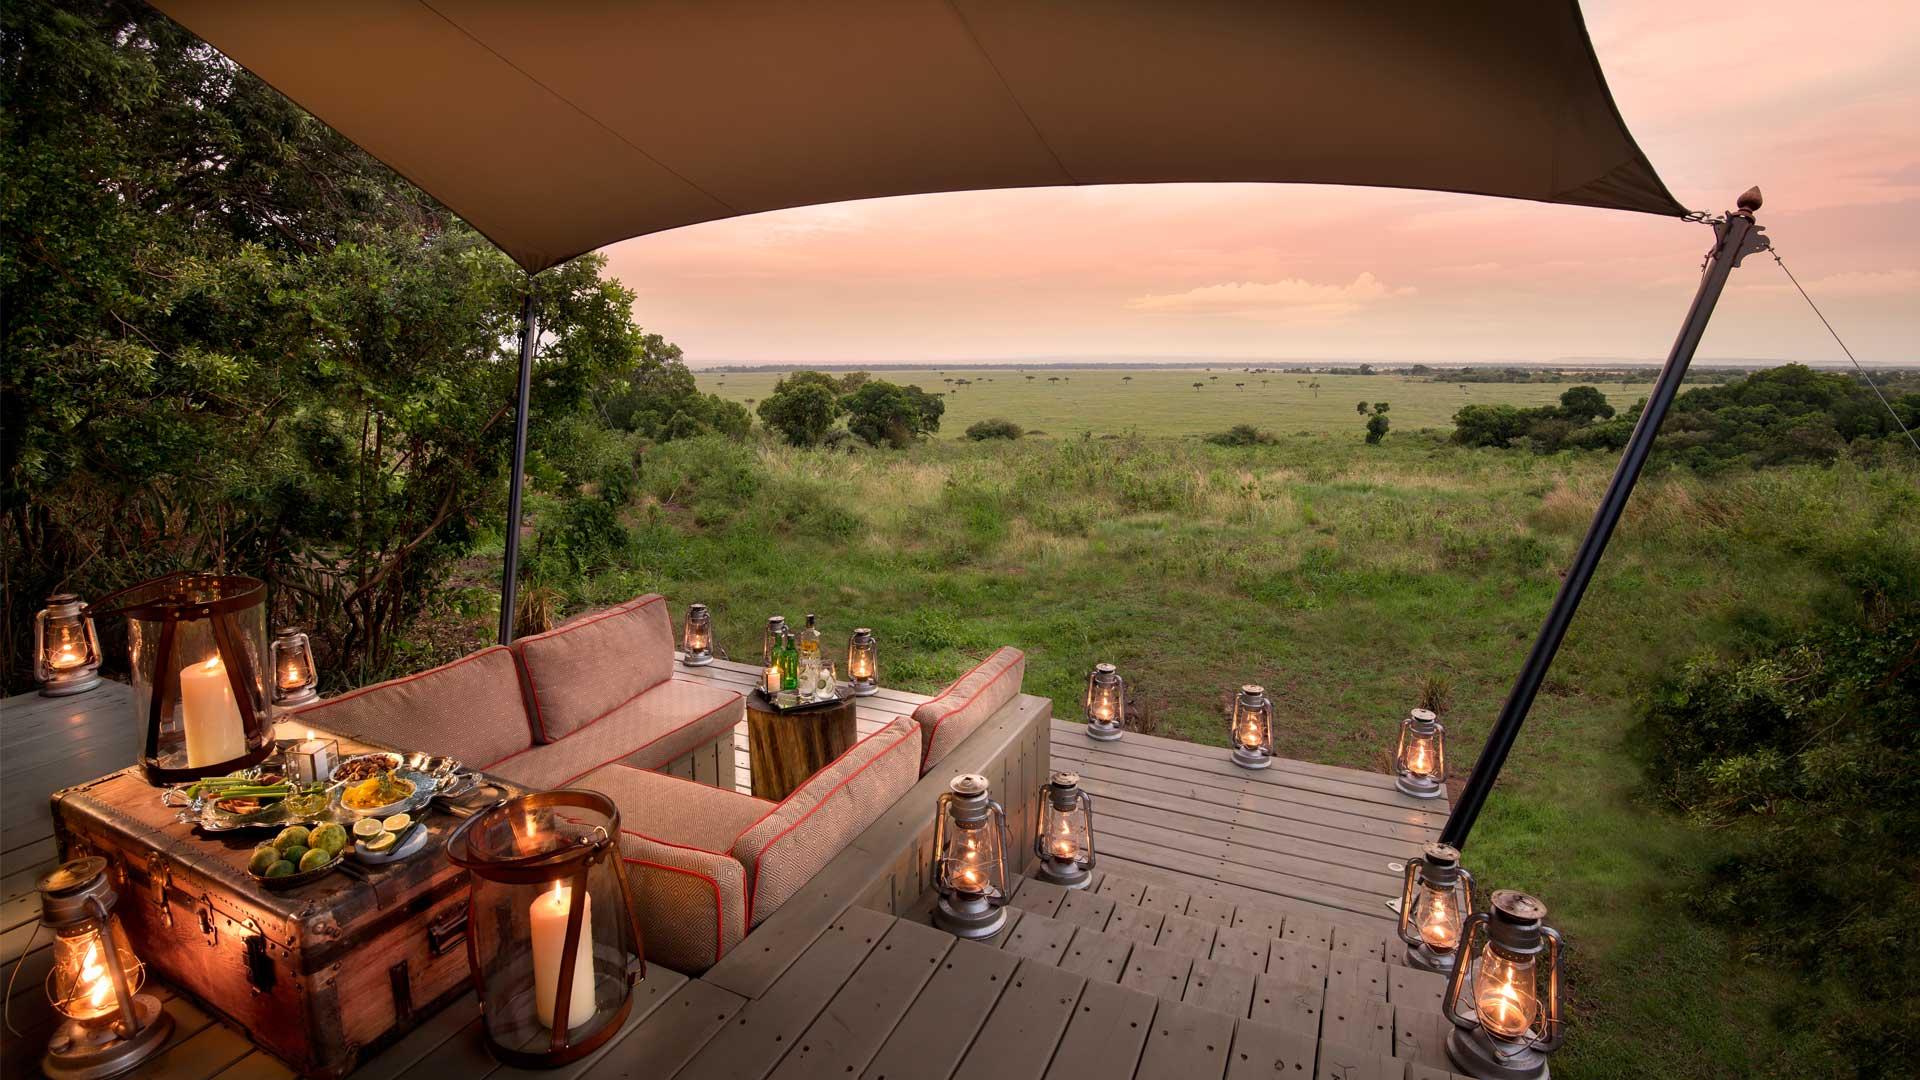 Maasai Mara Hotels in Kenya